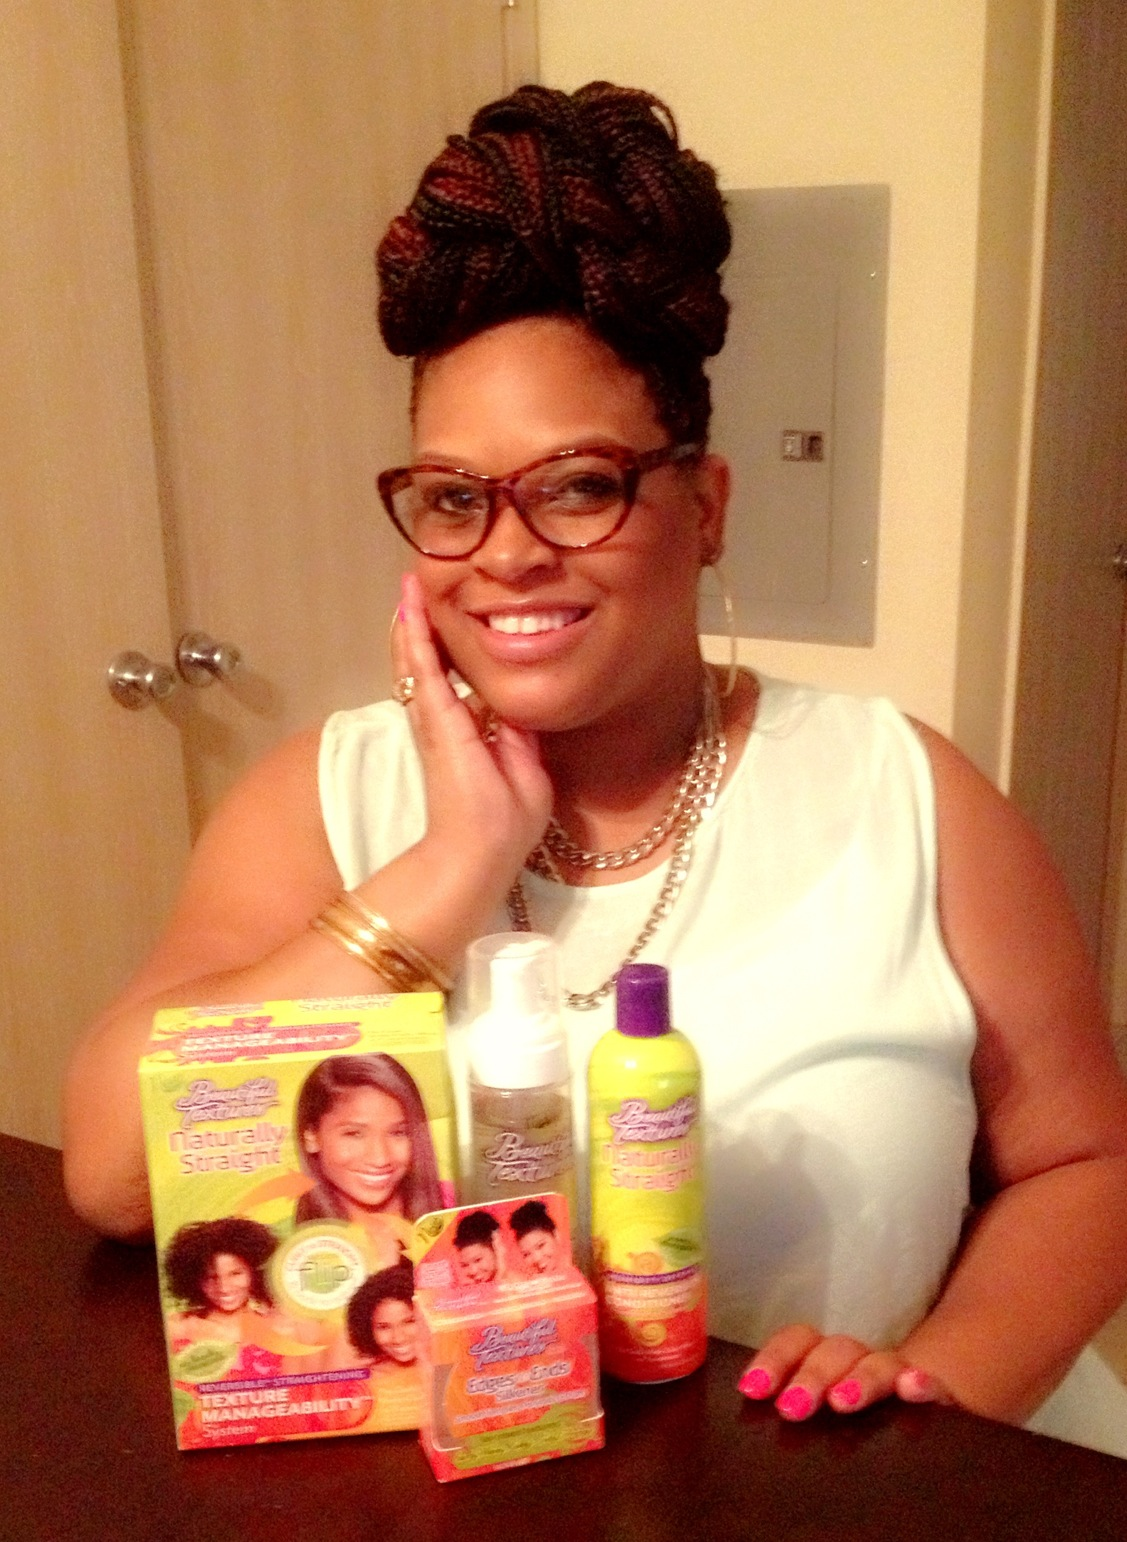 LaTanya Smith,  AlyiV.com Beautiful Textures Natural Summer Hair Giveaway Winner